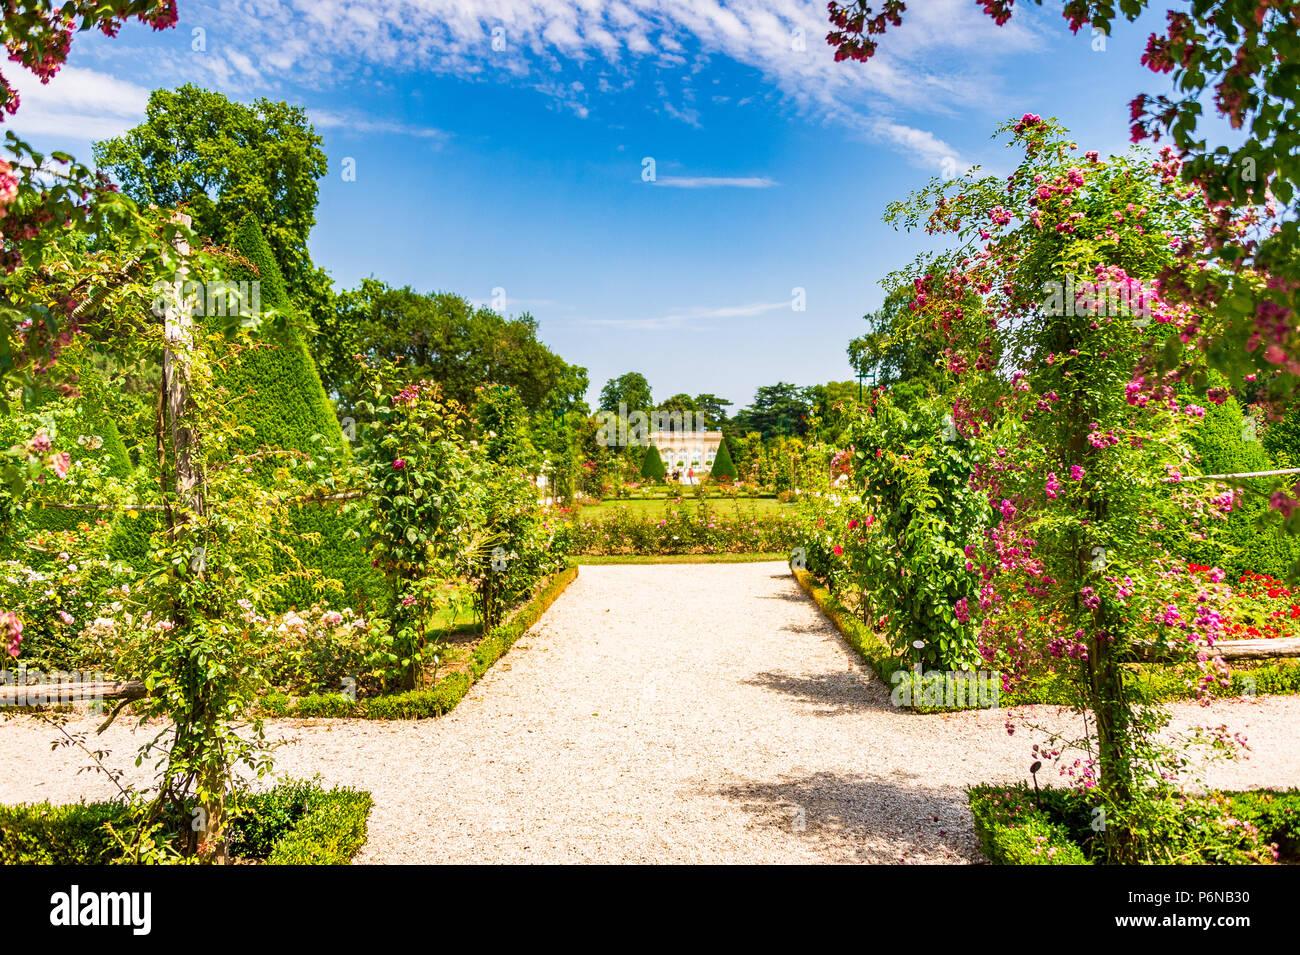 The spectacular Rose Garden within Parc de Bagatelle in Paris, France Stock Photo